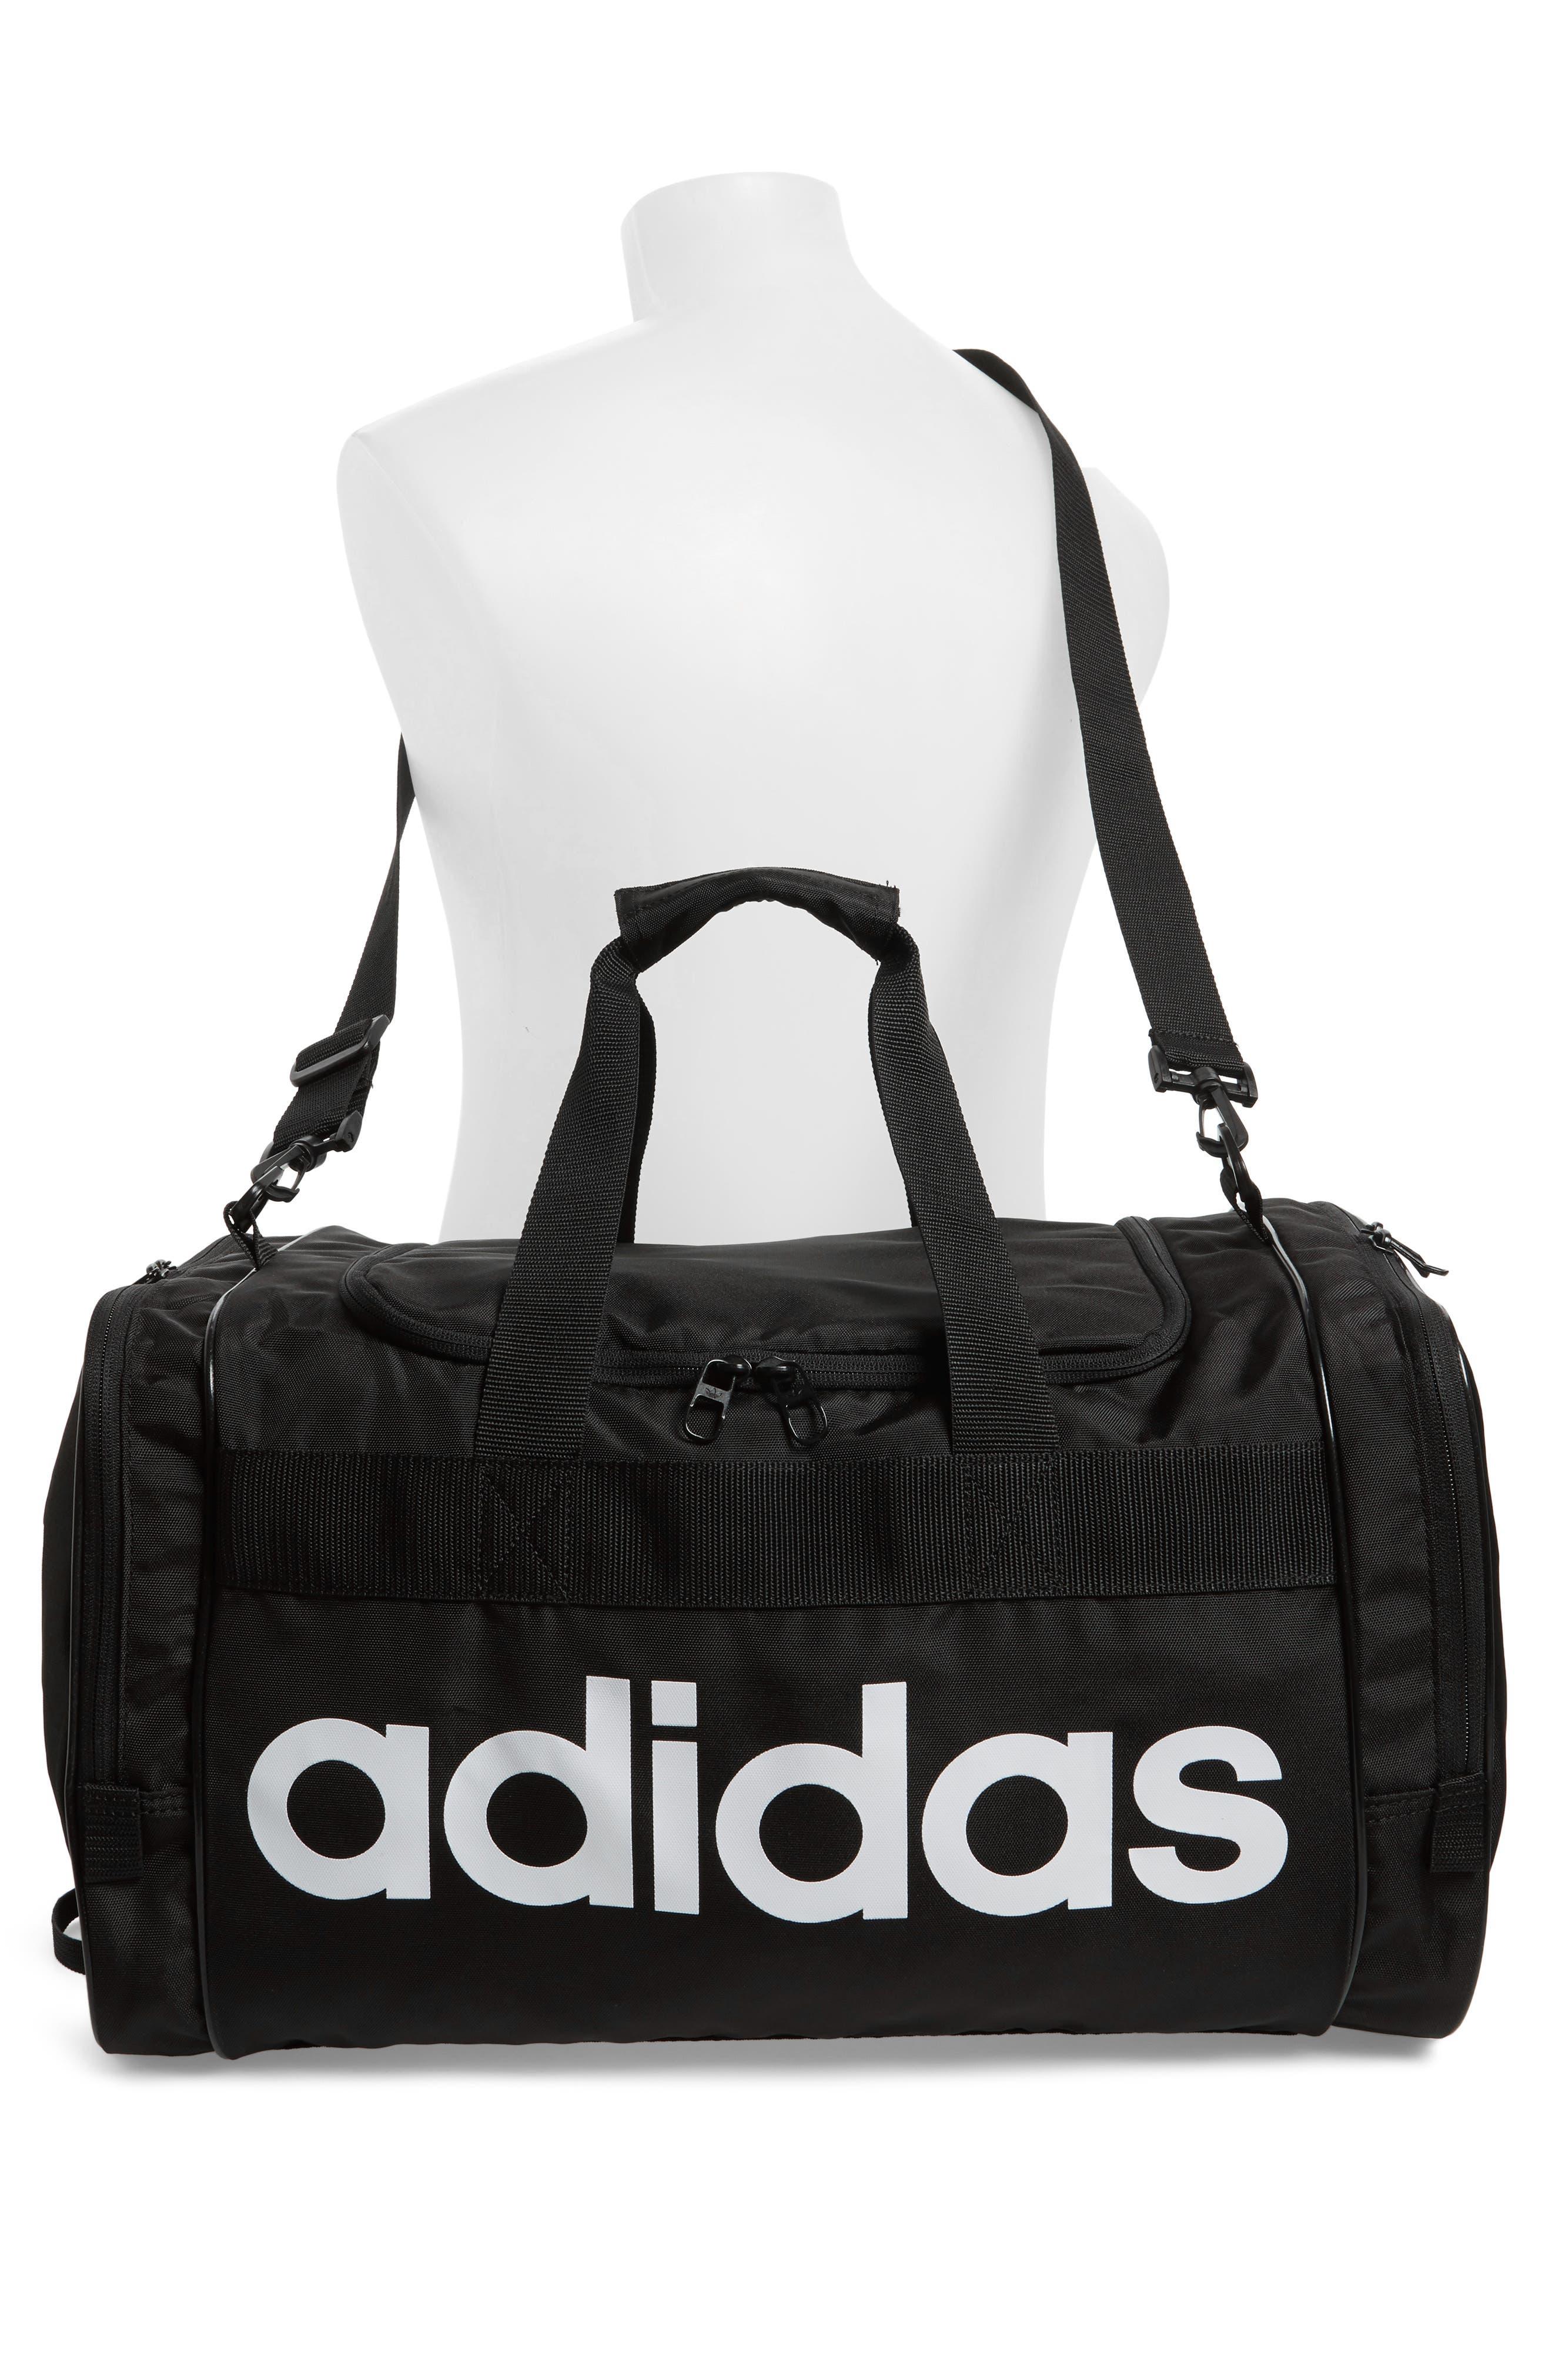 bfdb8b4b6c2d Adidas Originals Handbags   Wallets for Women